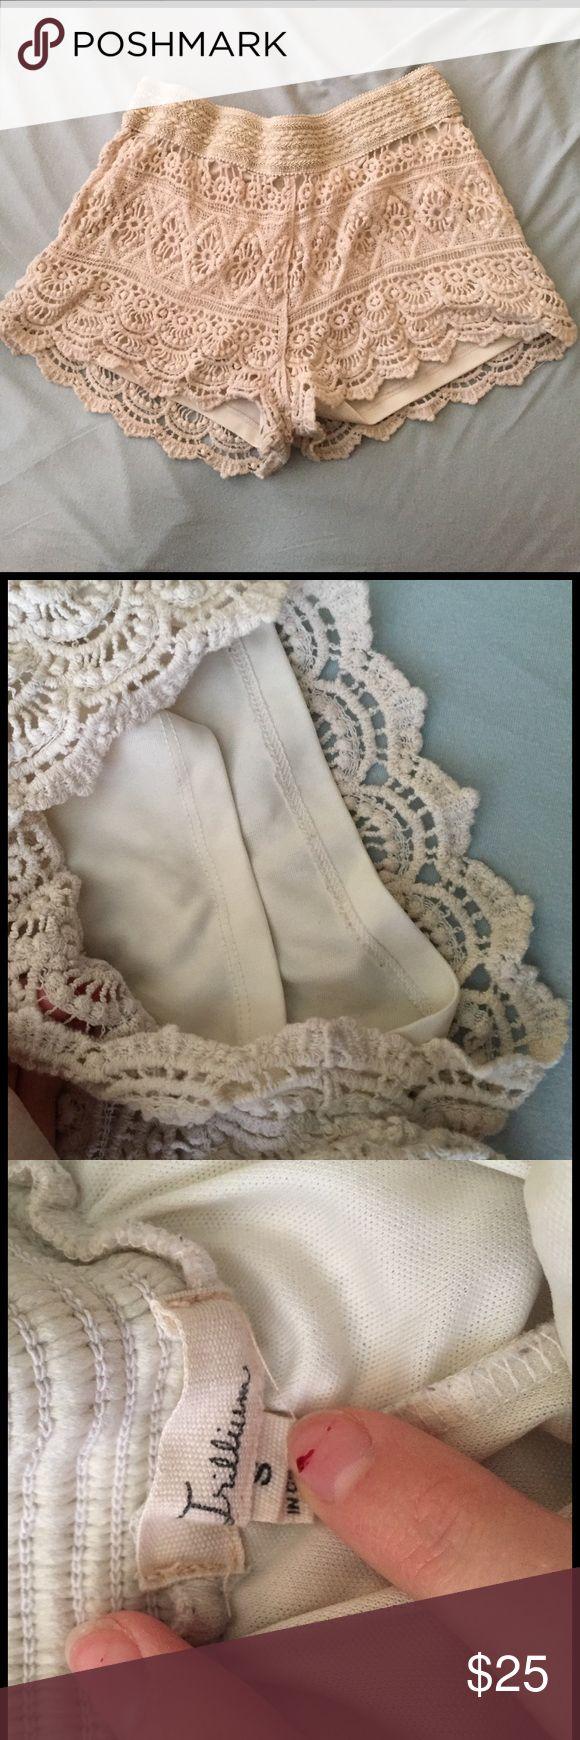 Cream Shorts With Spandex Waist Crochet, Super Comfy, Stretchy zumiez Shorts